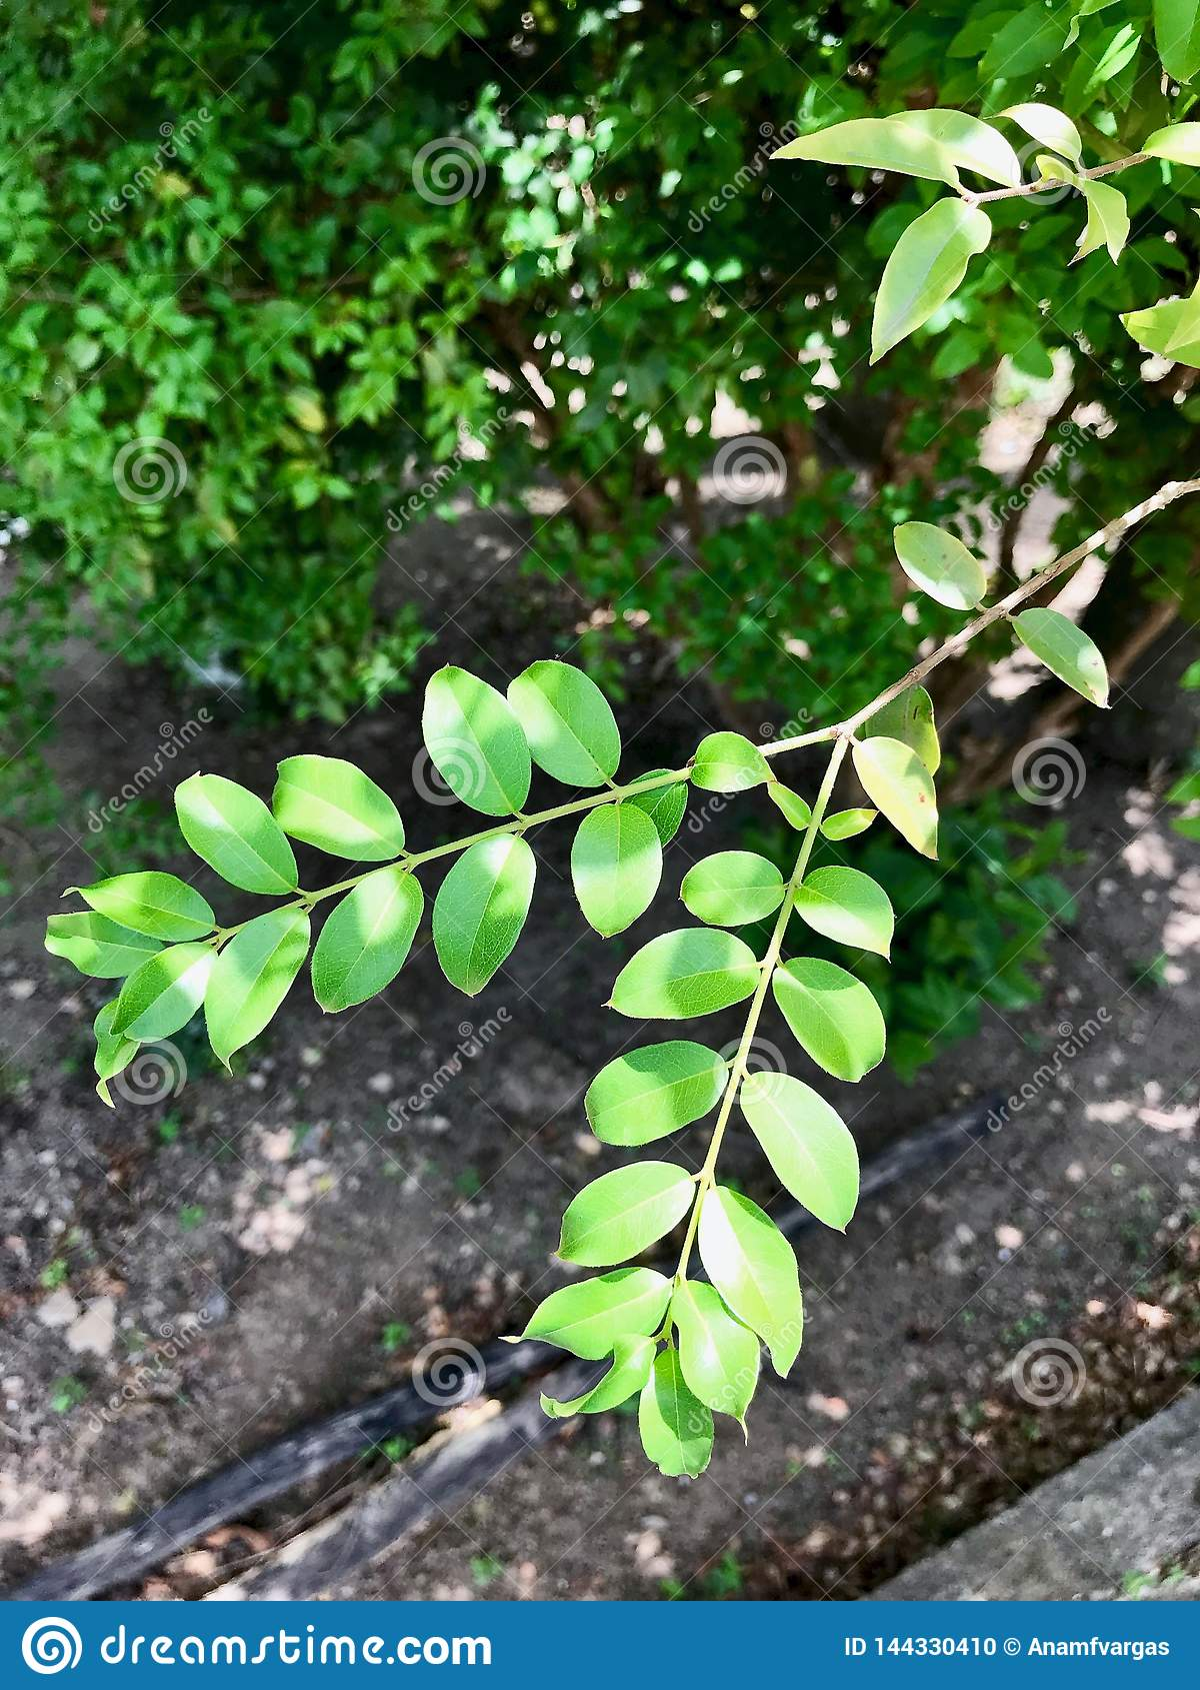 Closeup of a young green leaf